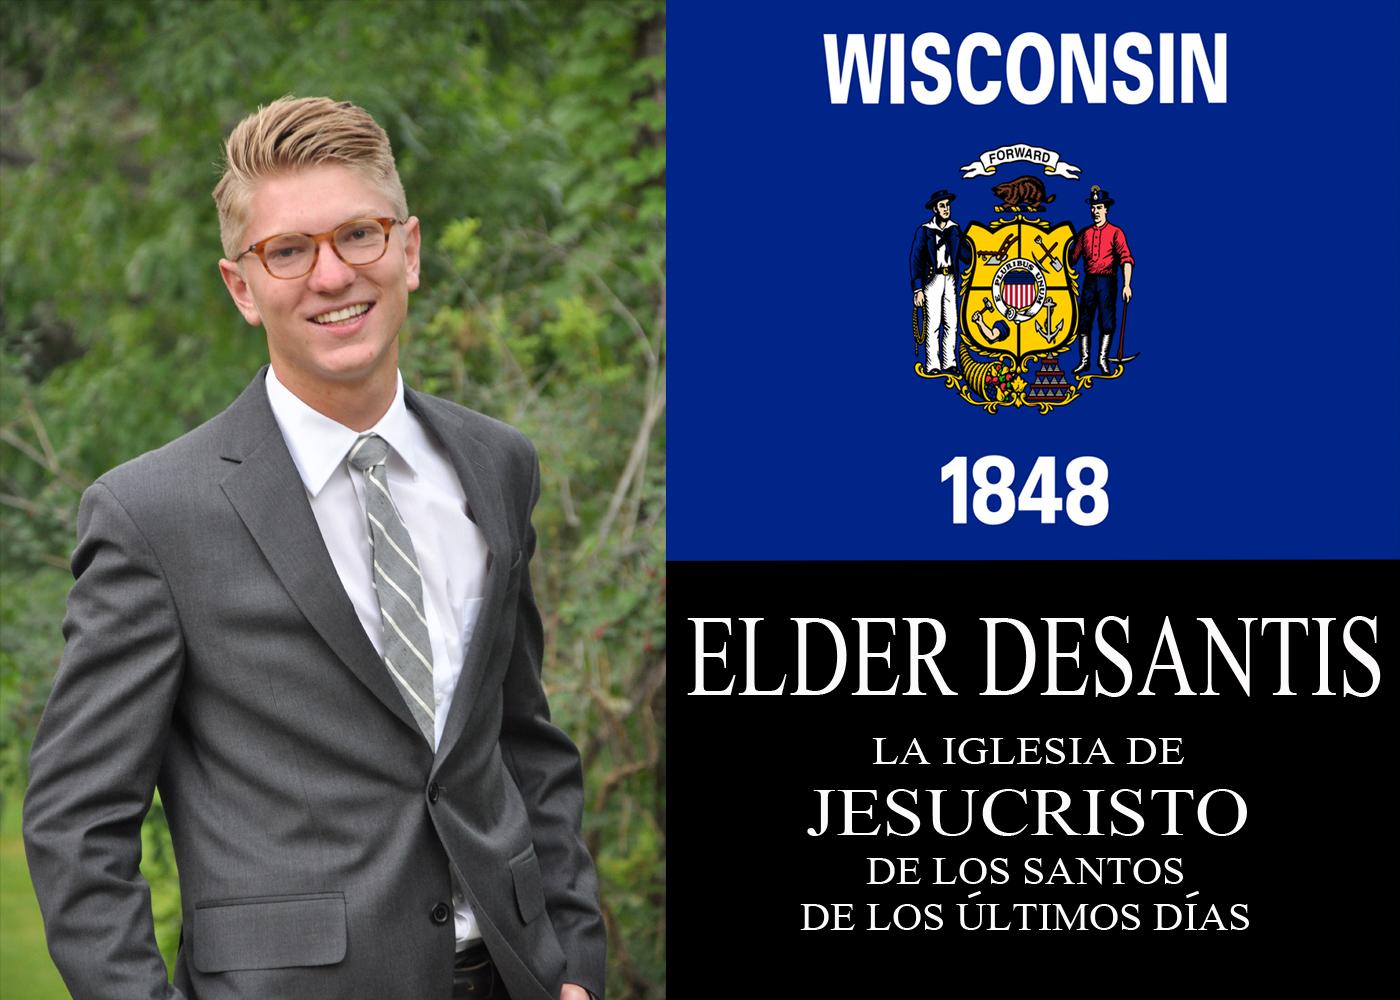 Elder DeSantis